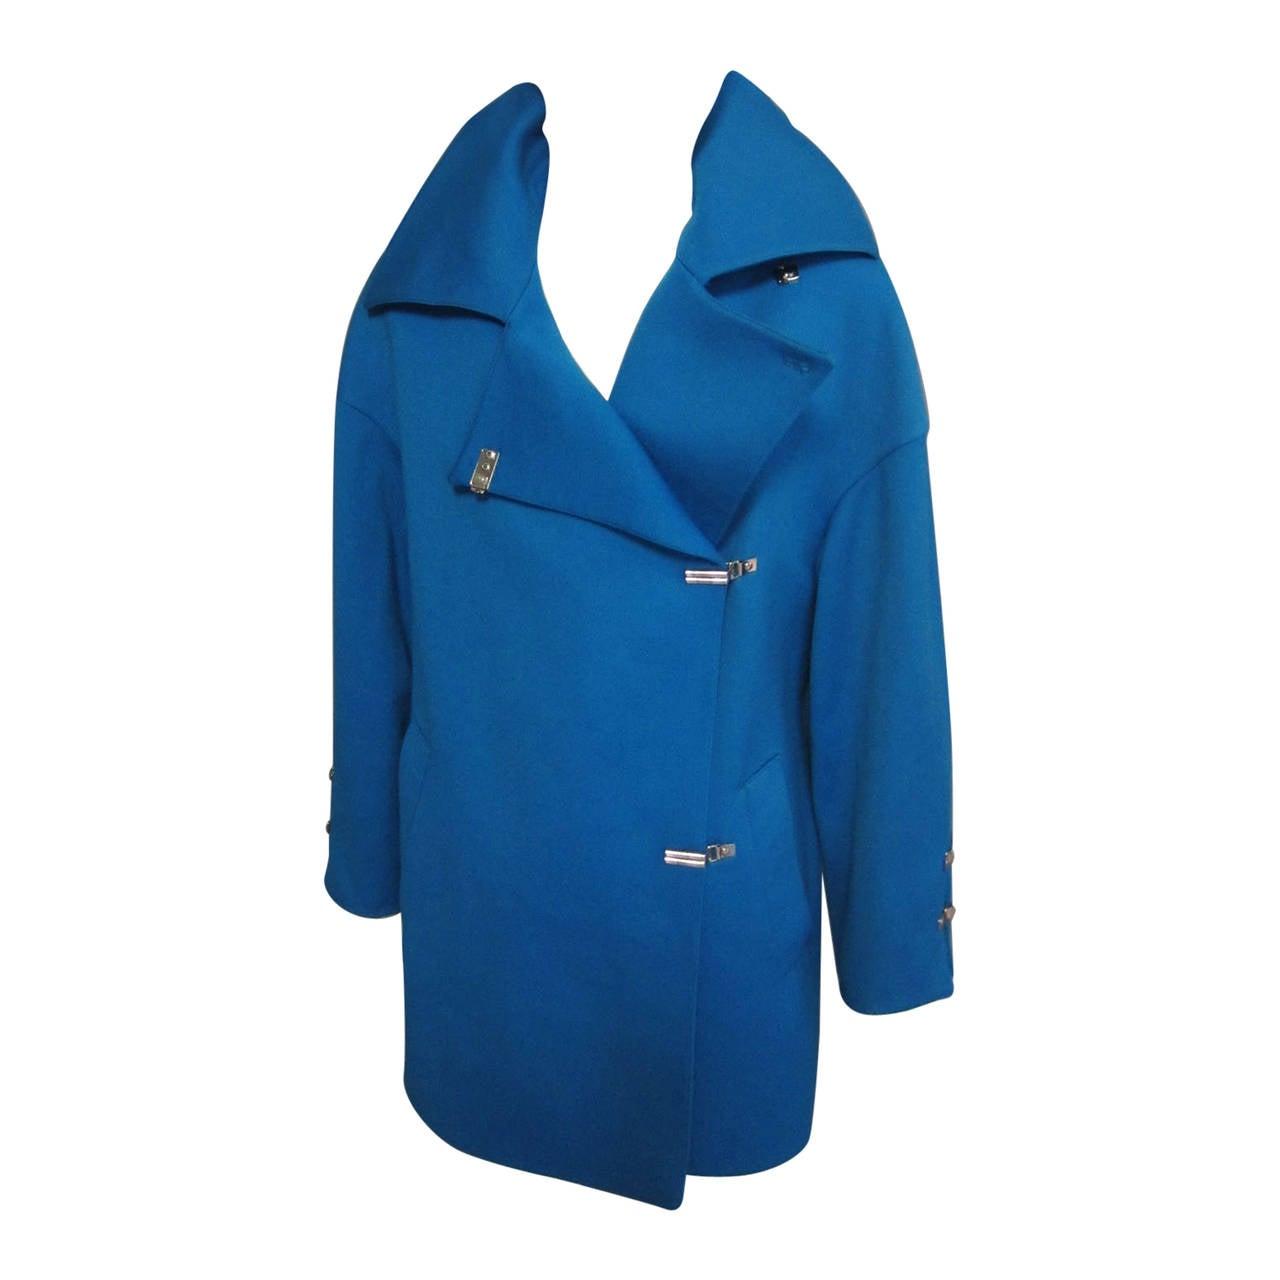 1980s CLAUDE MONTANA Teal Coat